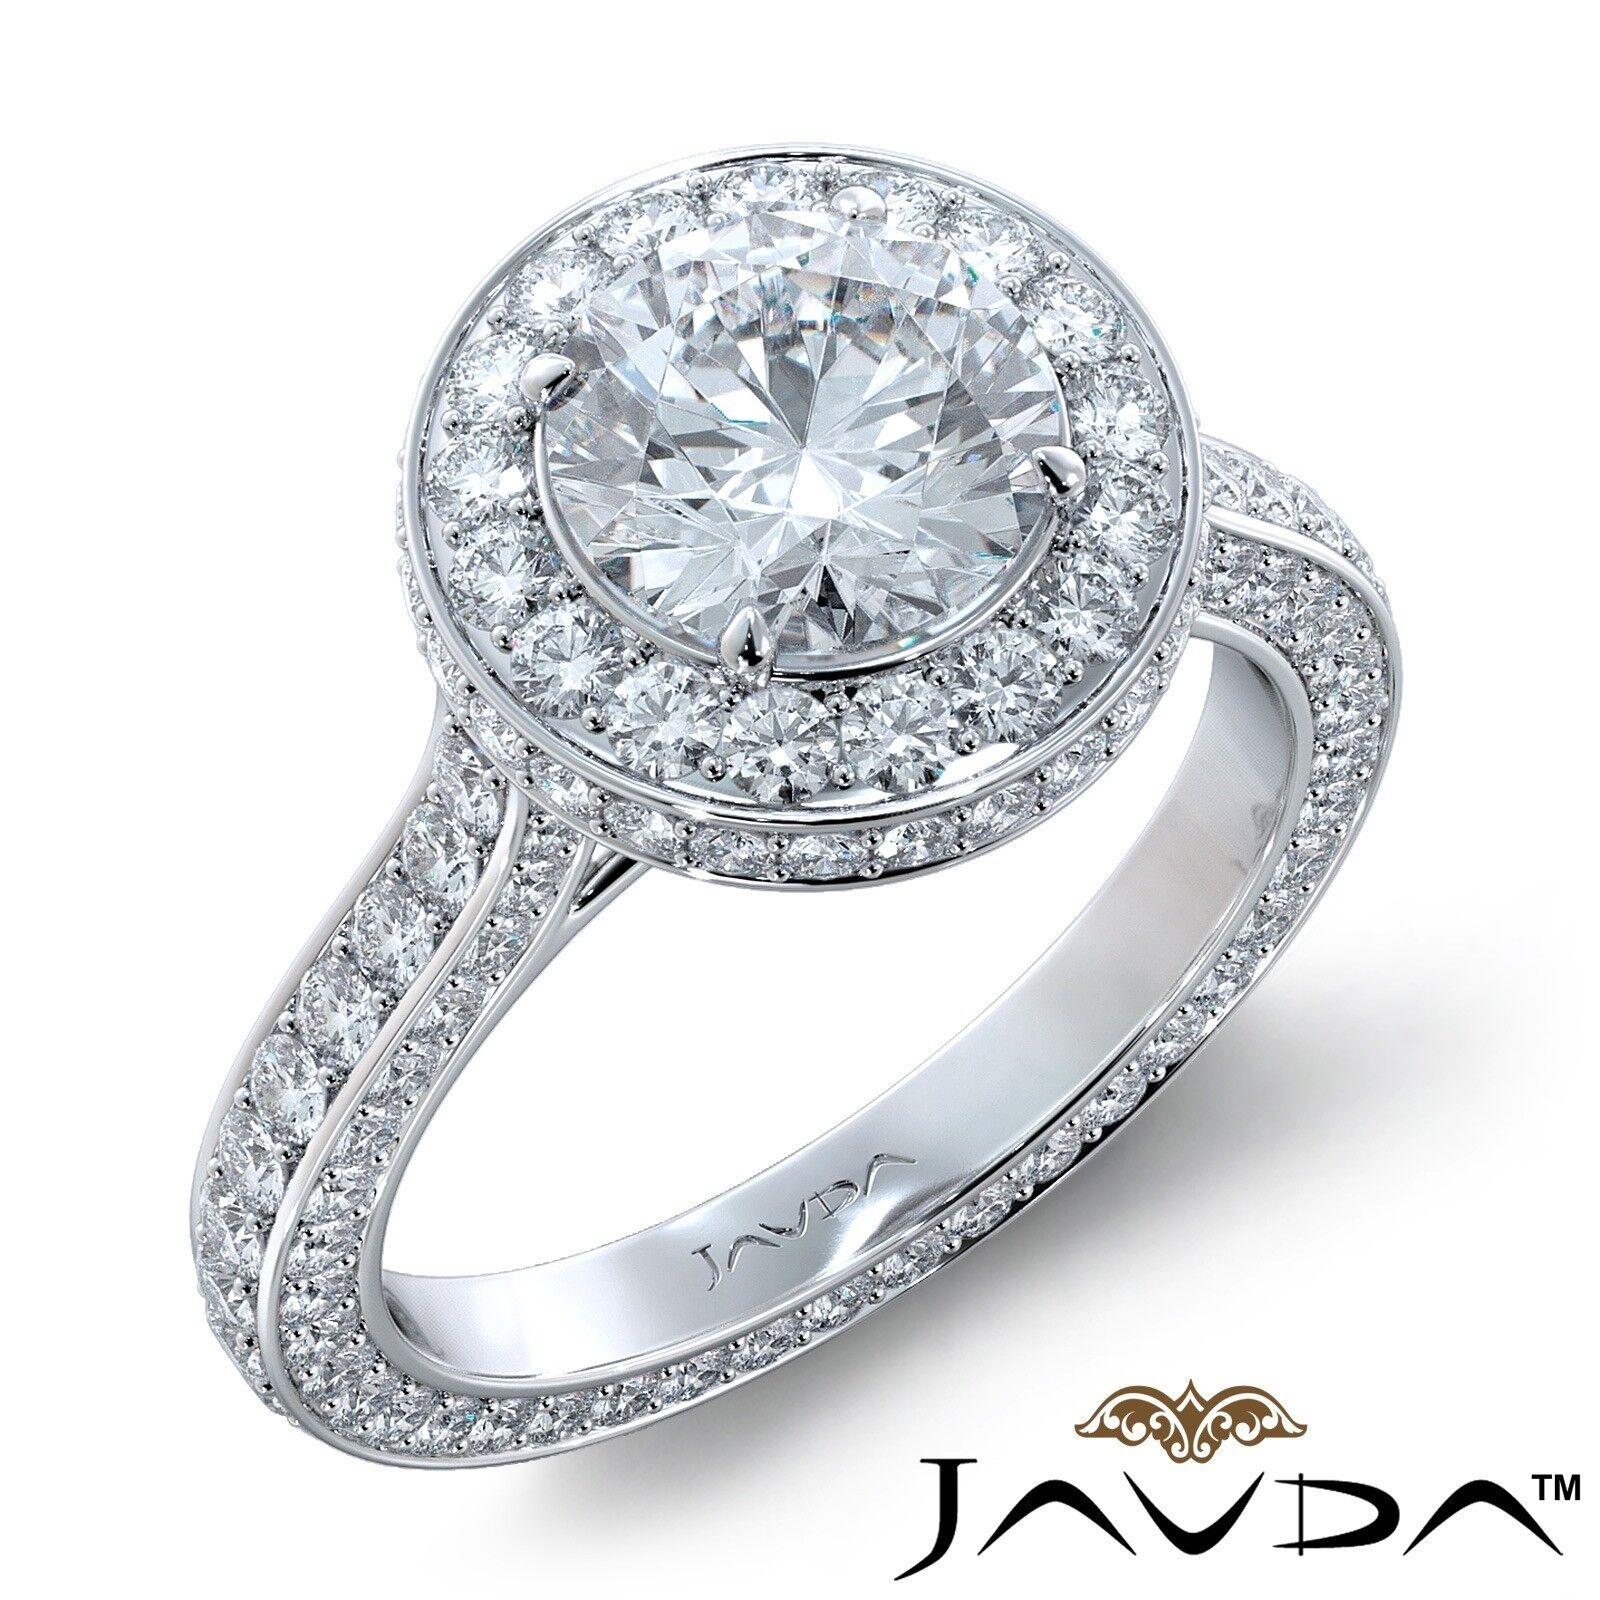 3ct Sidestone Eternity Halo Round Diamond Engagement Ring GIA F-VVS1 White Gold